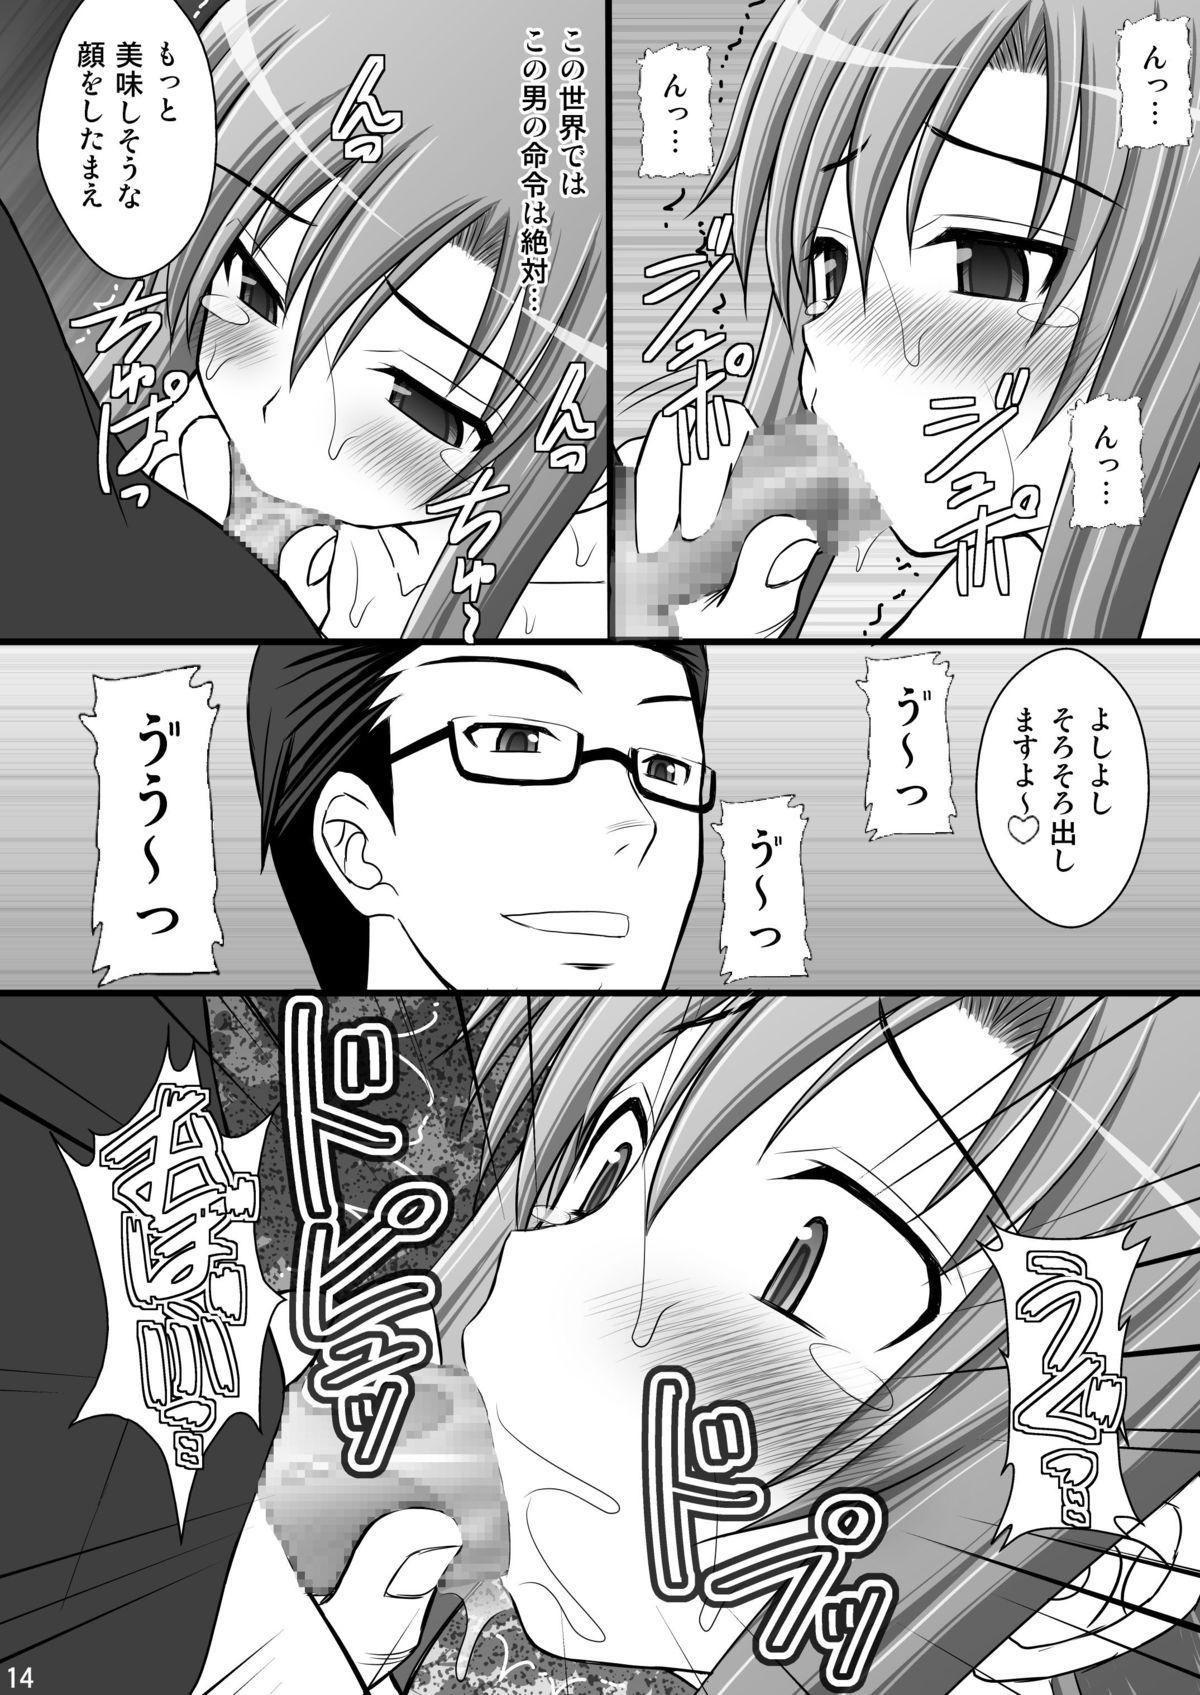 Toraware Hime I - System Master Nyaa Sakarae nee 12